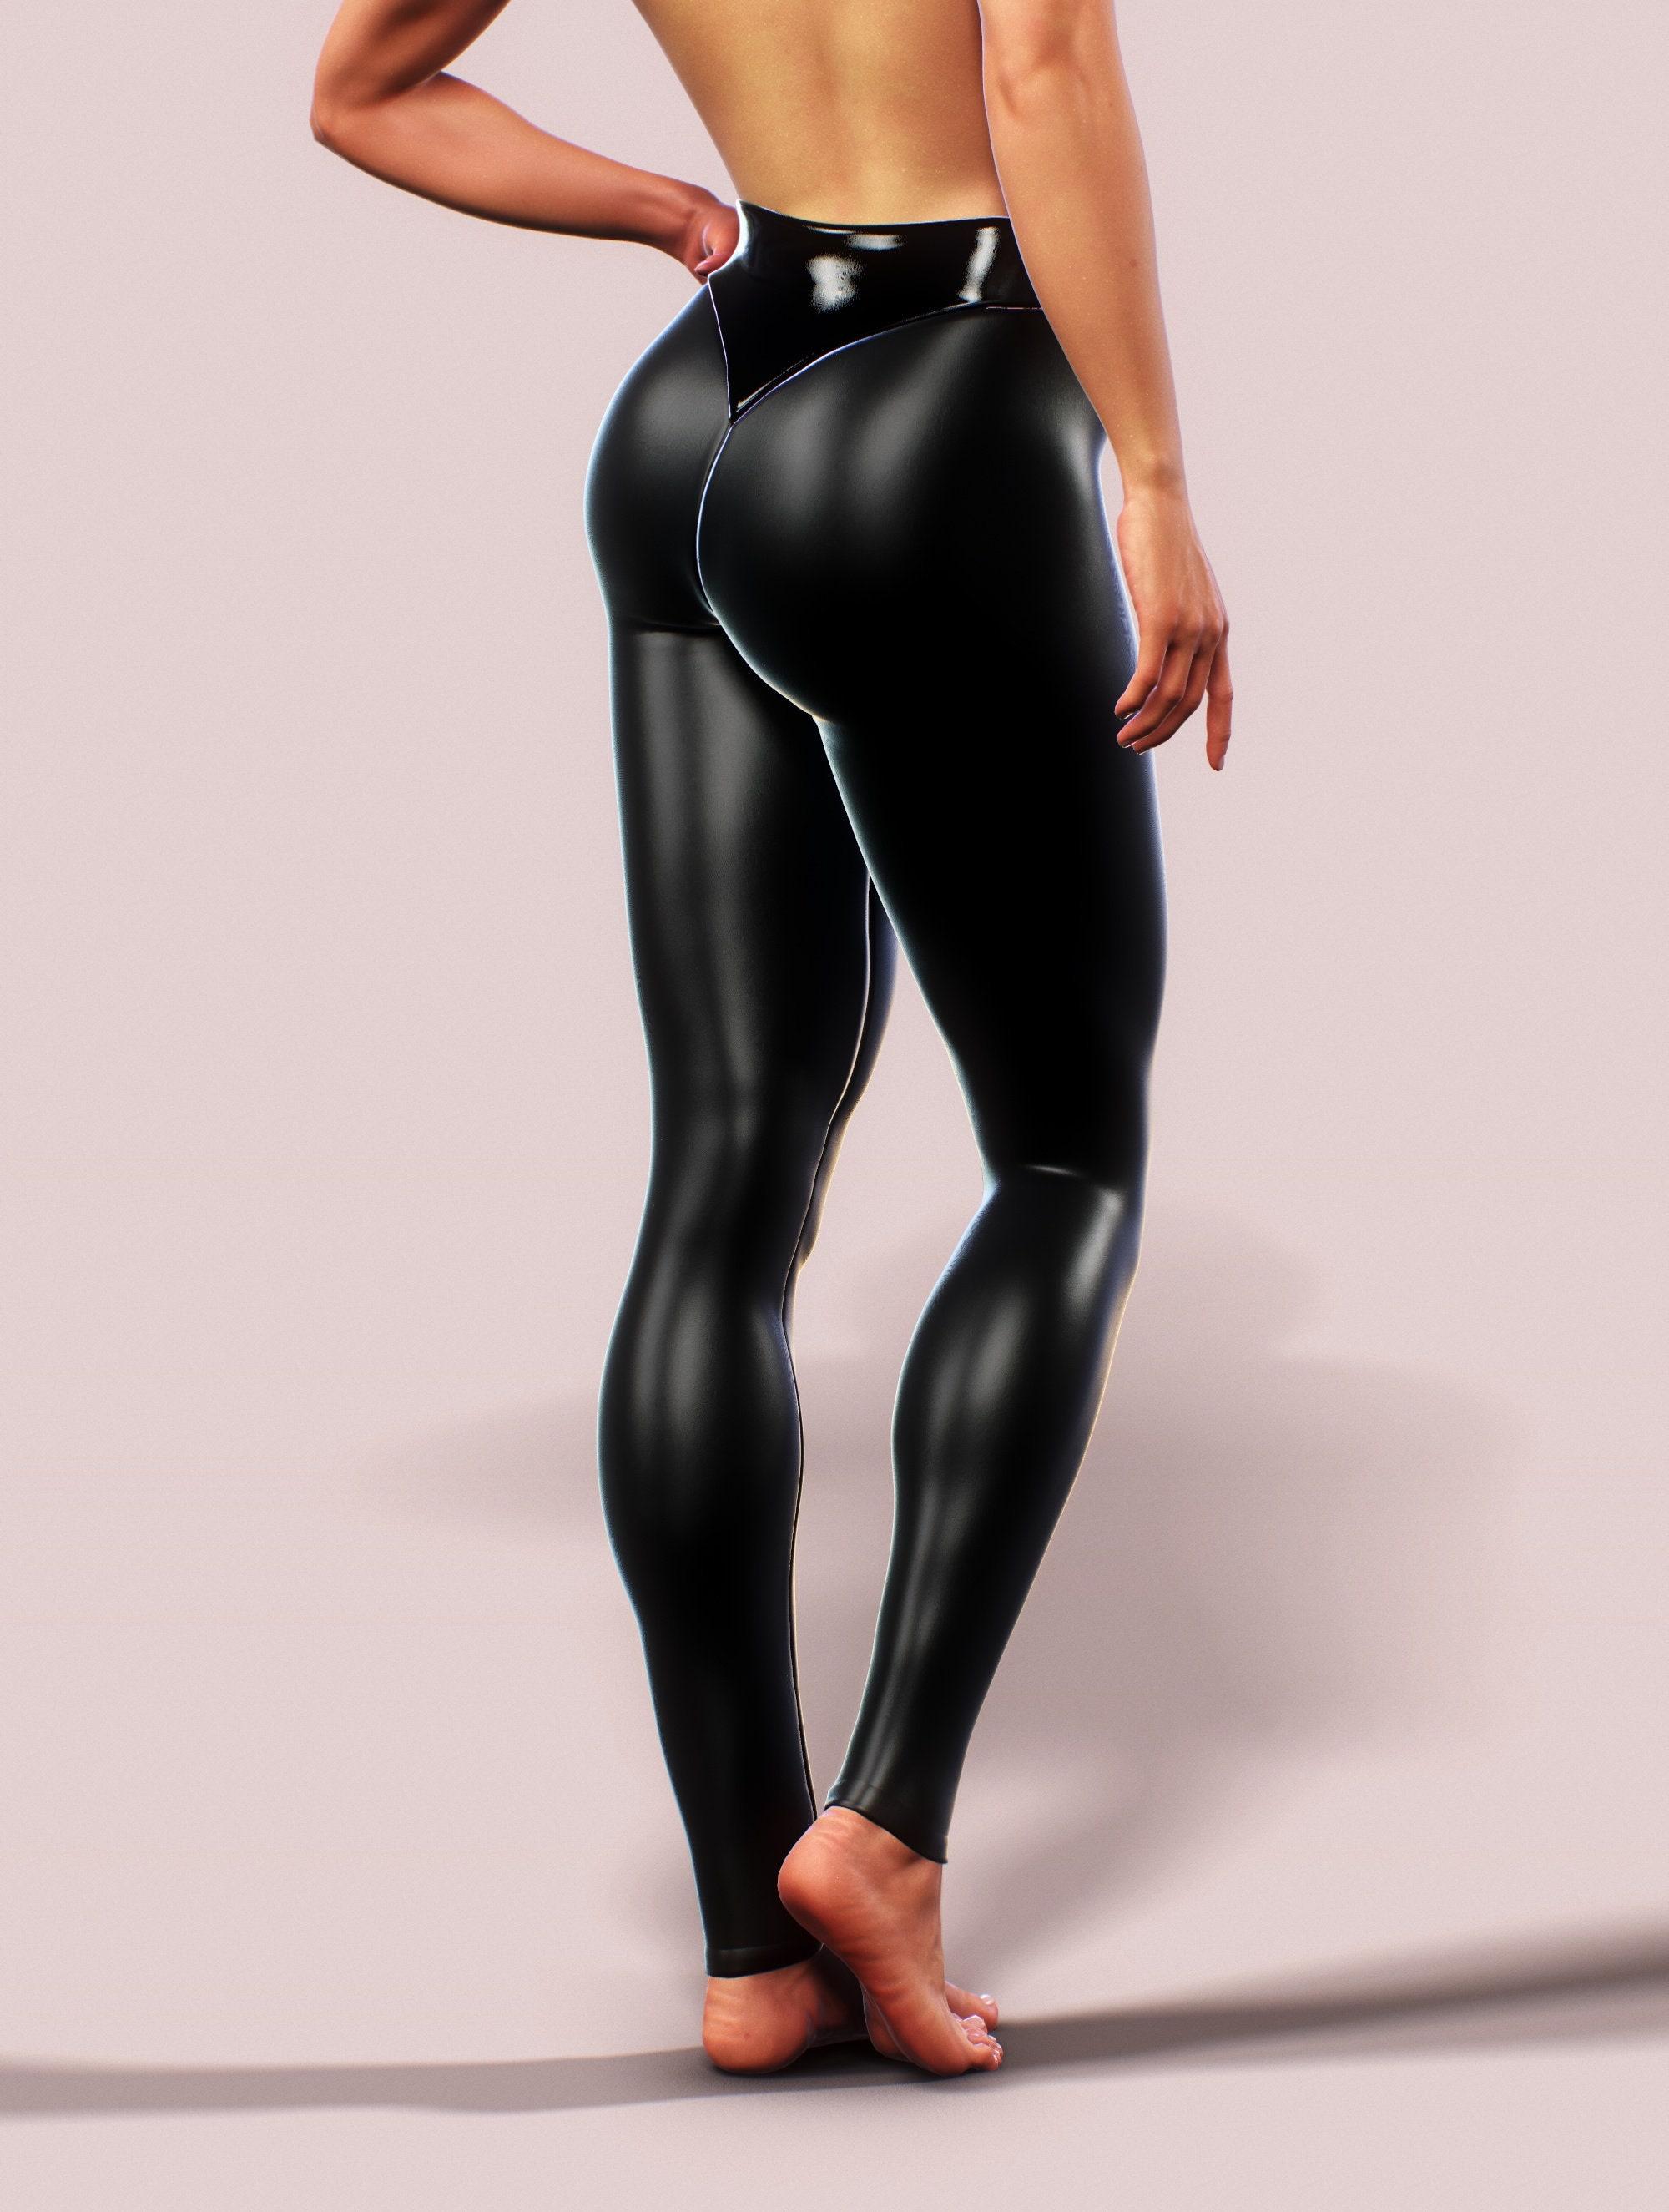 Latex tights